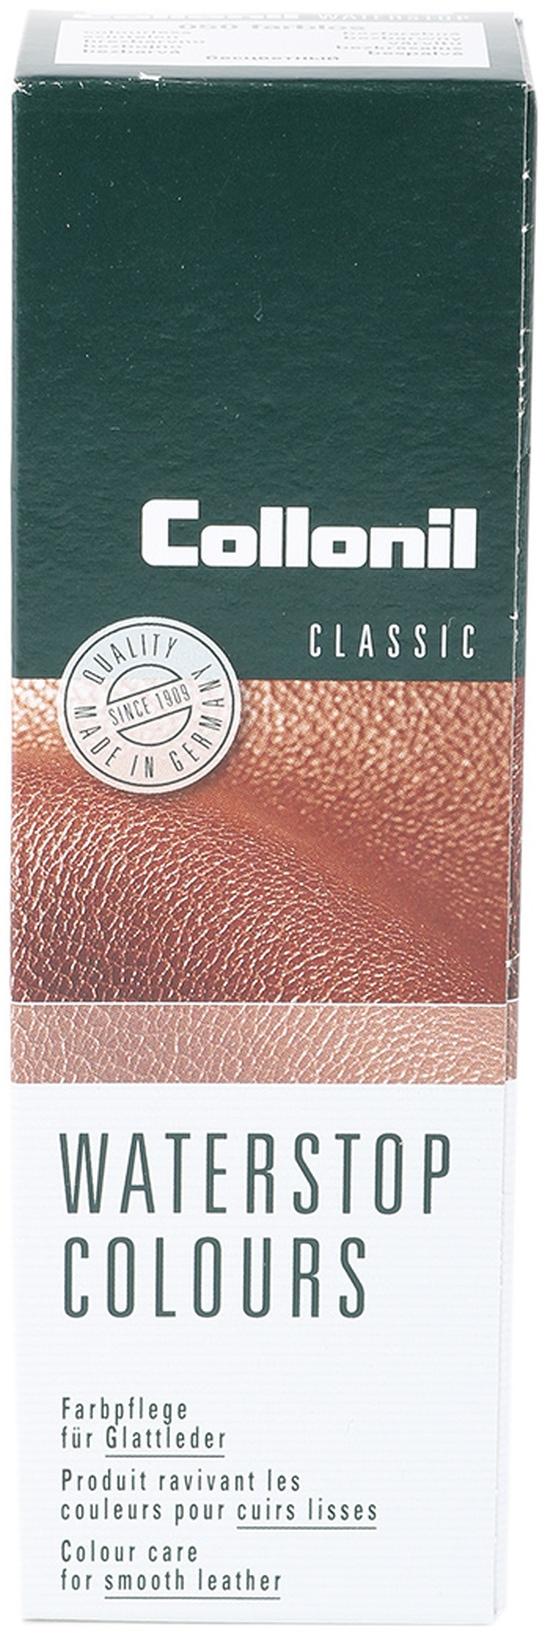 Collonil Waterstop Leather Cream Darkbrown foto 0